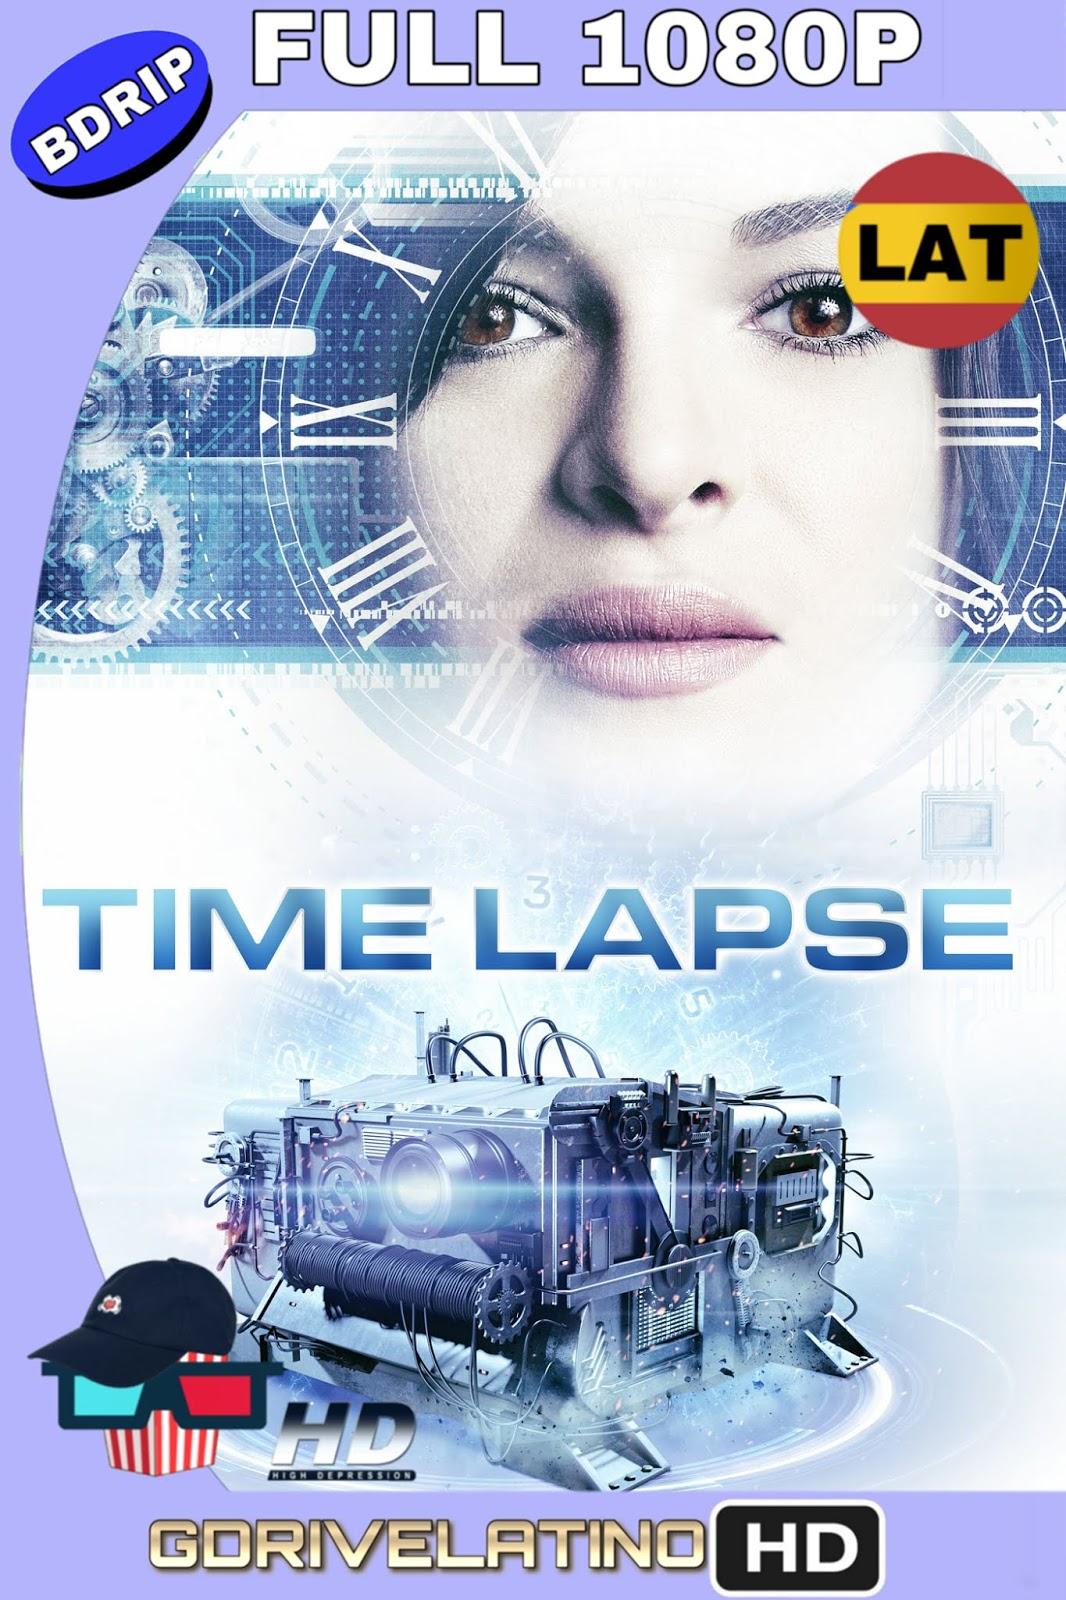 Lapso de tiempo (2014) BDRip FULL 1080p (Latino-Inglés) MKV